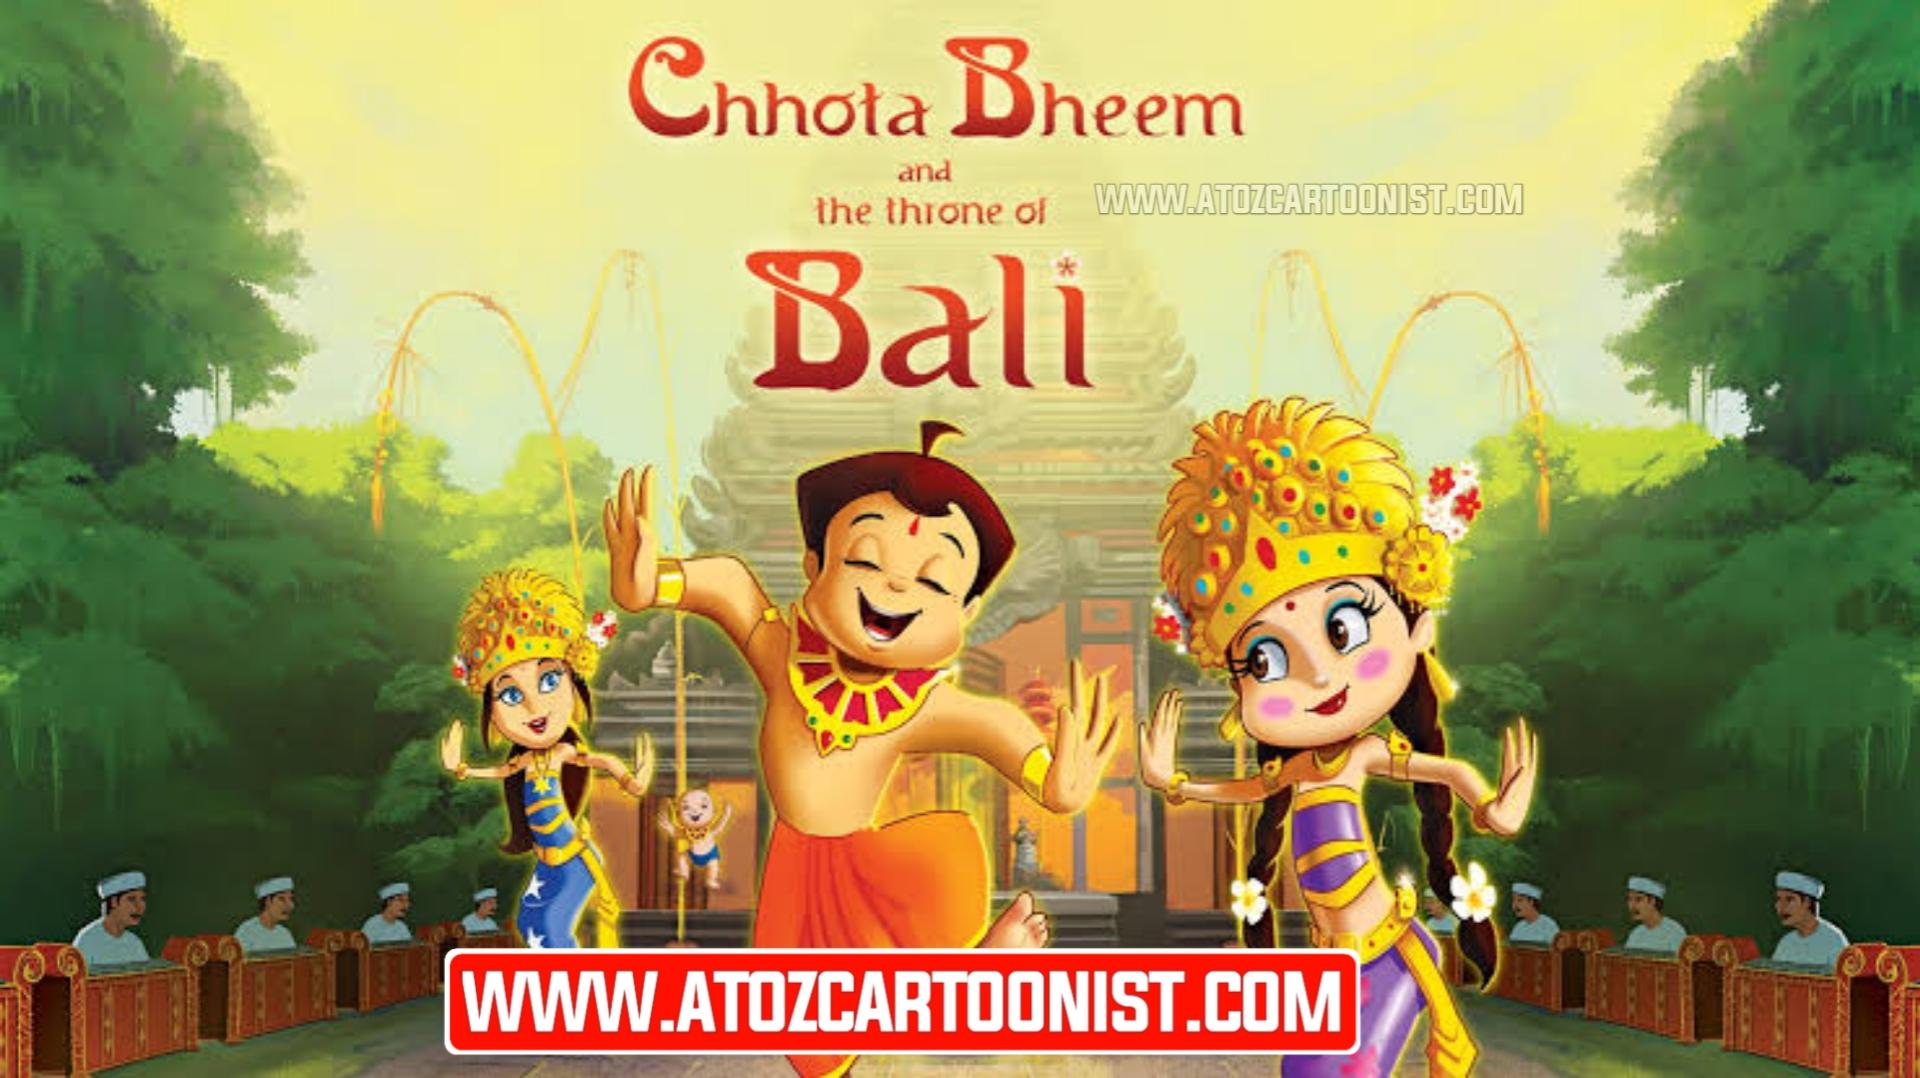 CHHOTA BHEEM AND THE THRONE OF BALI FULL MOVIE IN HINDI – TAMIL – TELUGU DOWNLOAD (480P, 720P & 1080P)